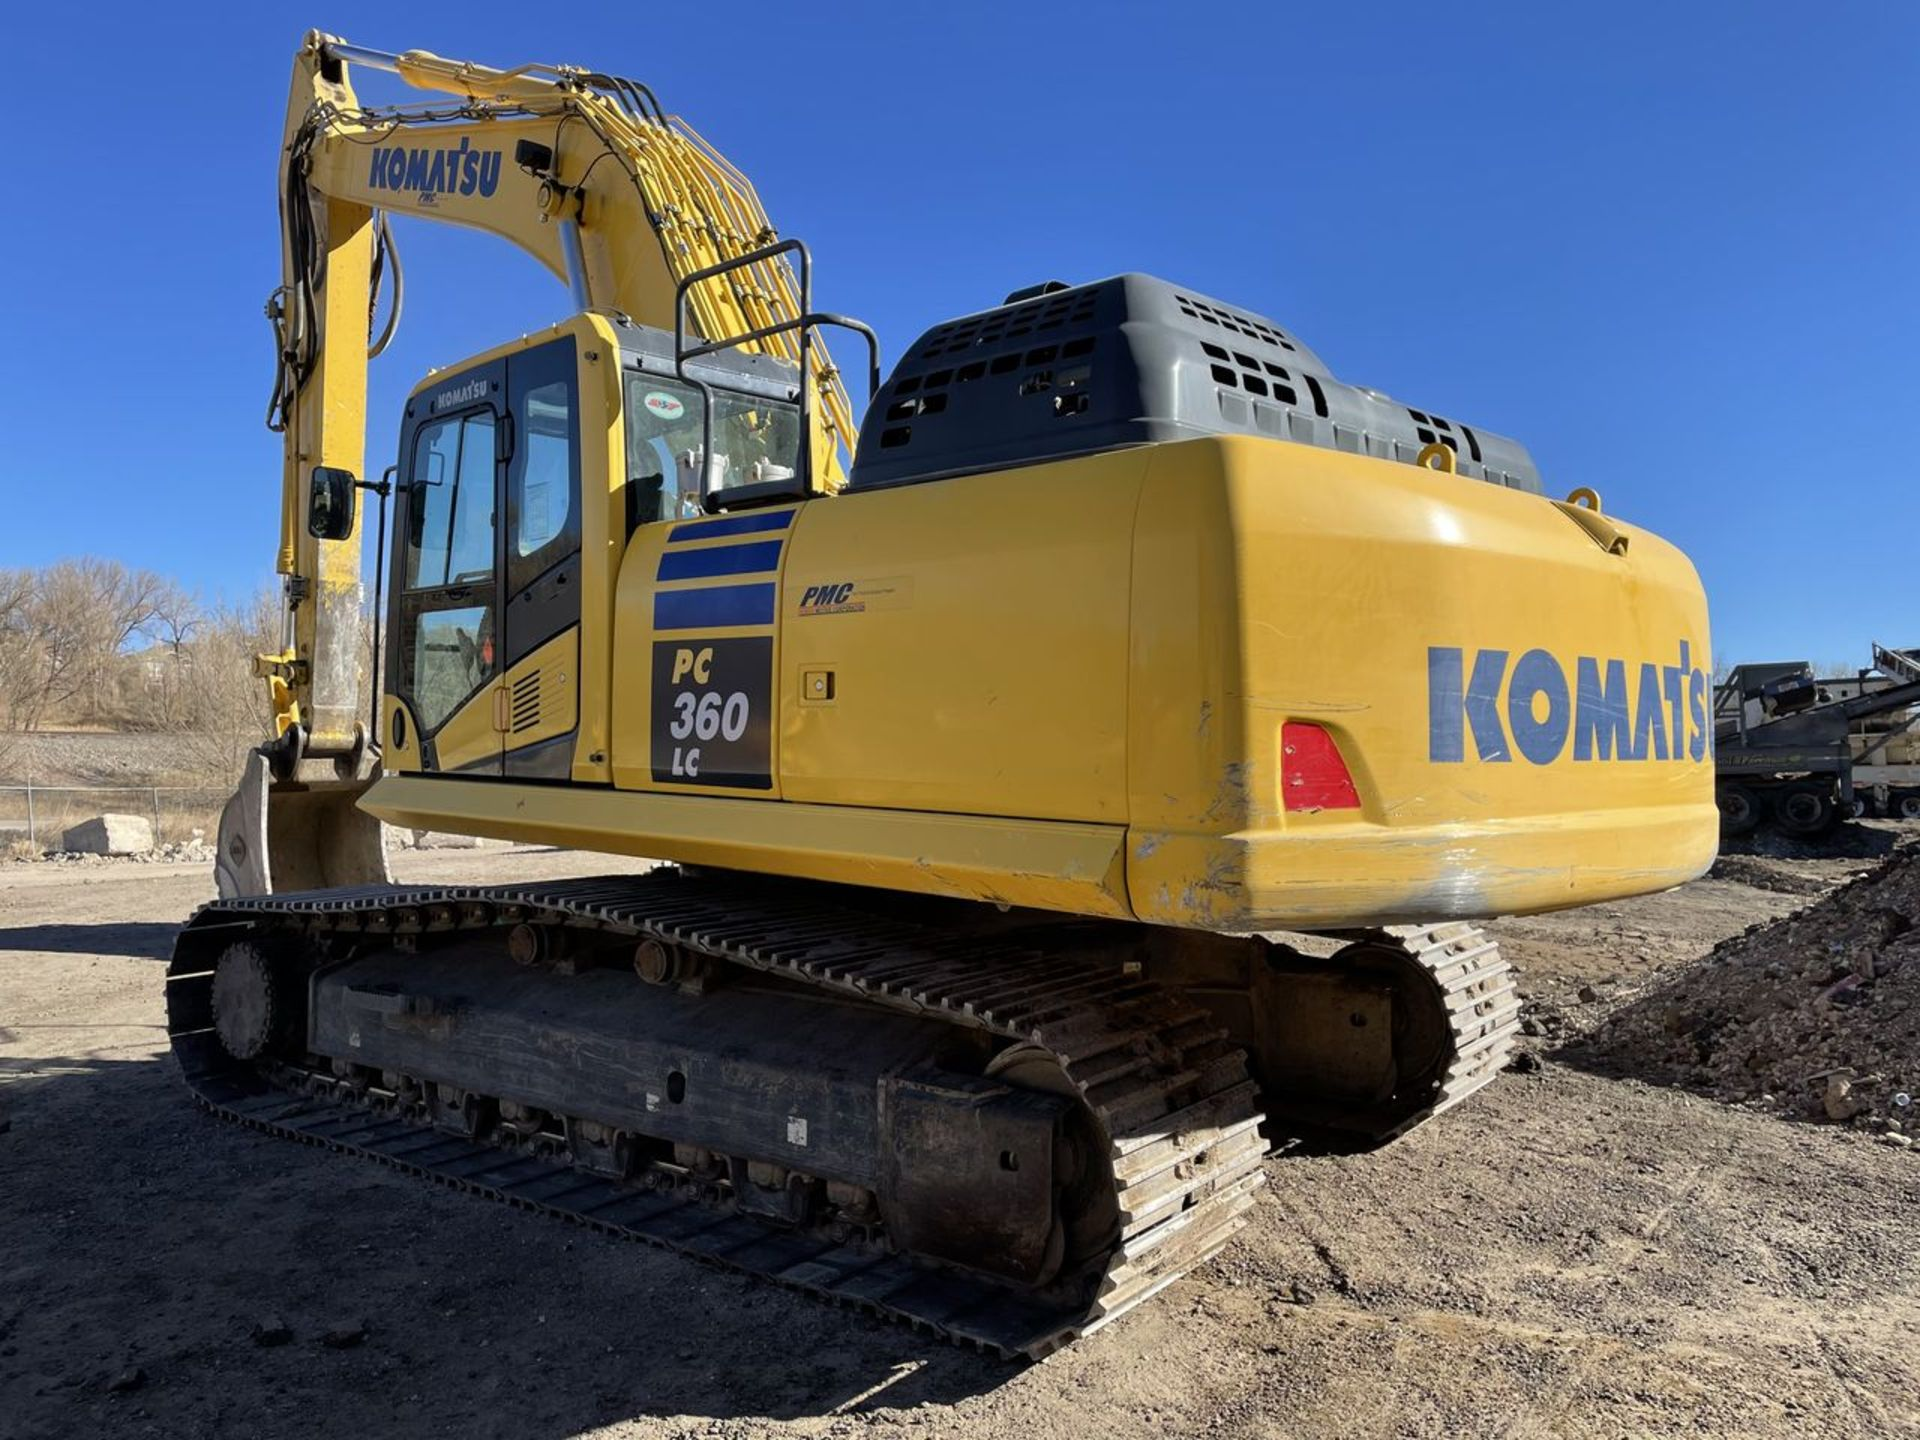 2018 Komatsu PC360LC-11 Hydraulic Crawler Excavator, S/N: A36863, PIN: KMTPC256CJWA36863; with 2,883 - Image 4 of 19